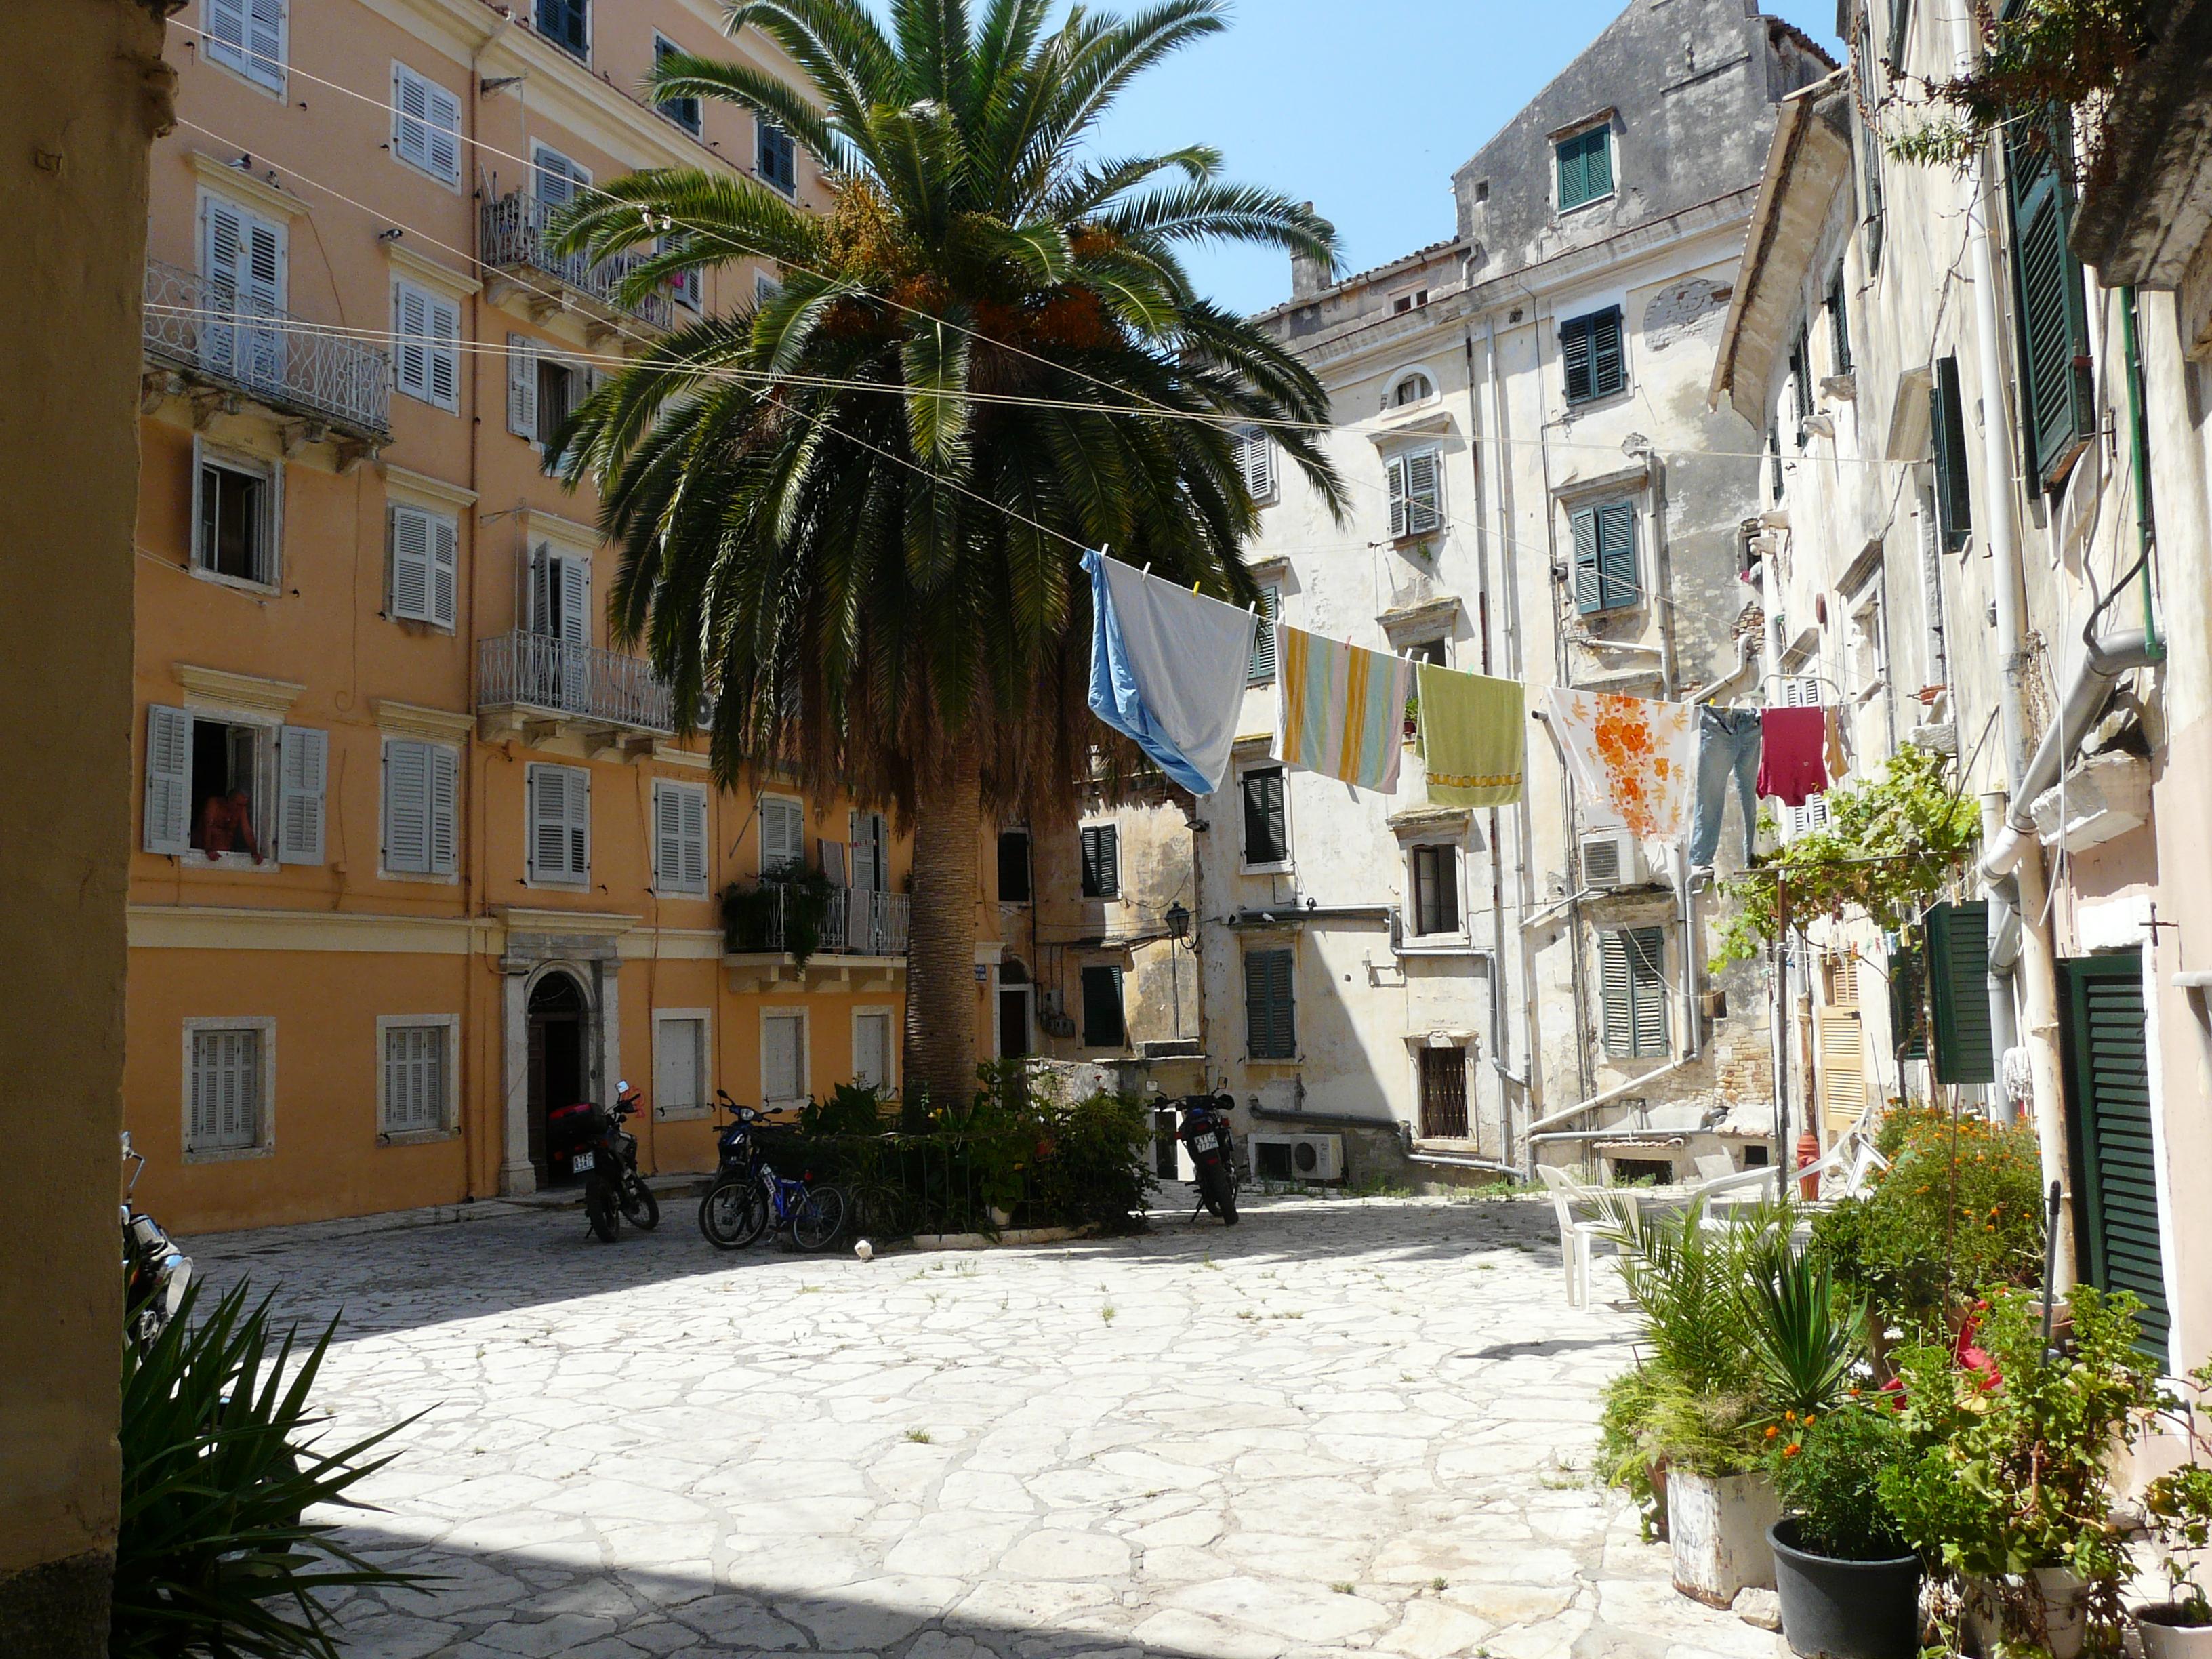 File:Corfu town 54.JPG - Wikimedia Commons